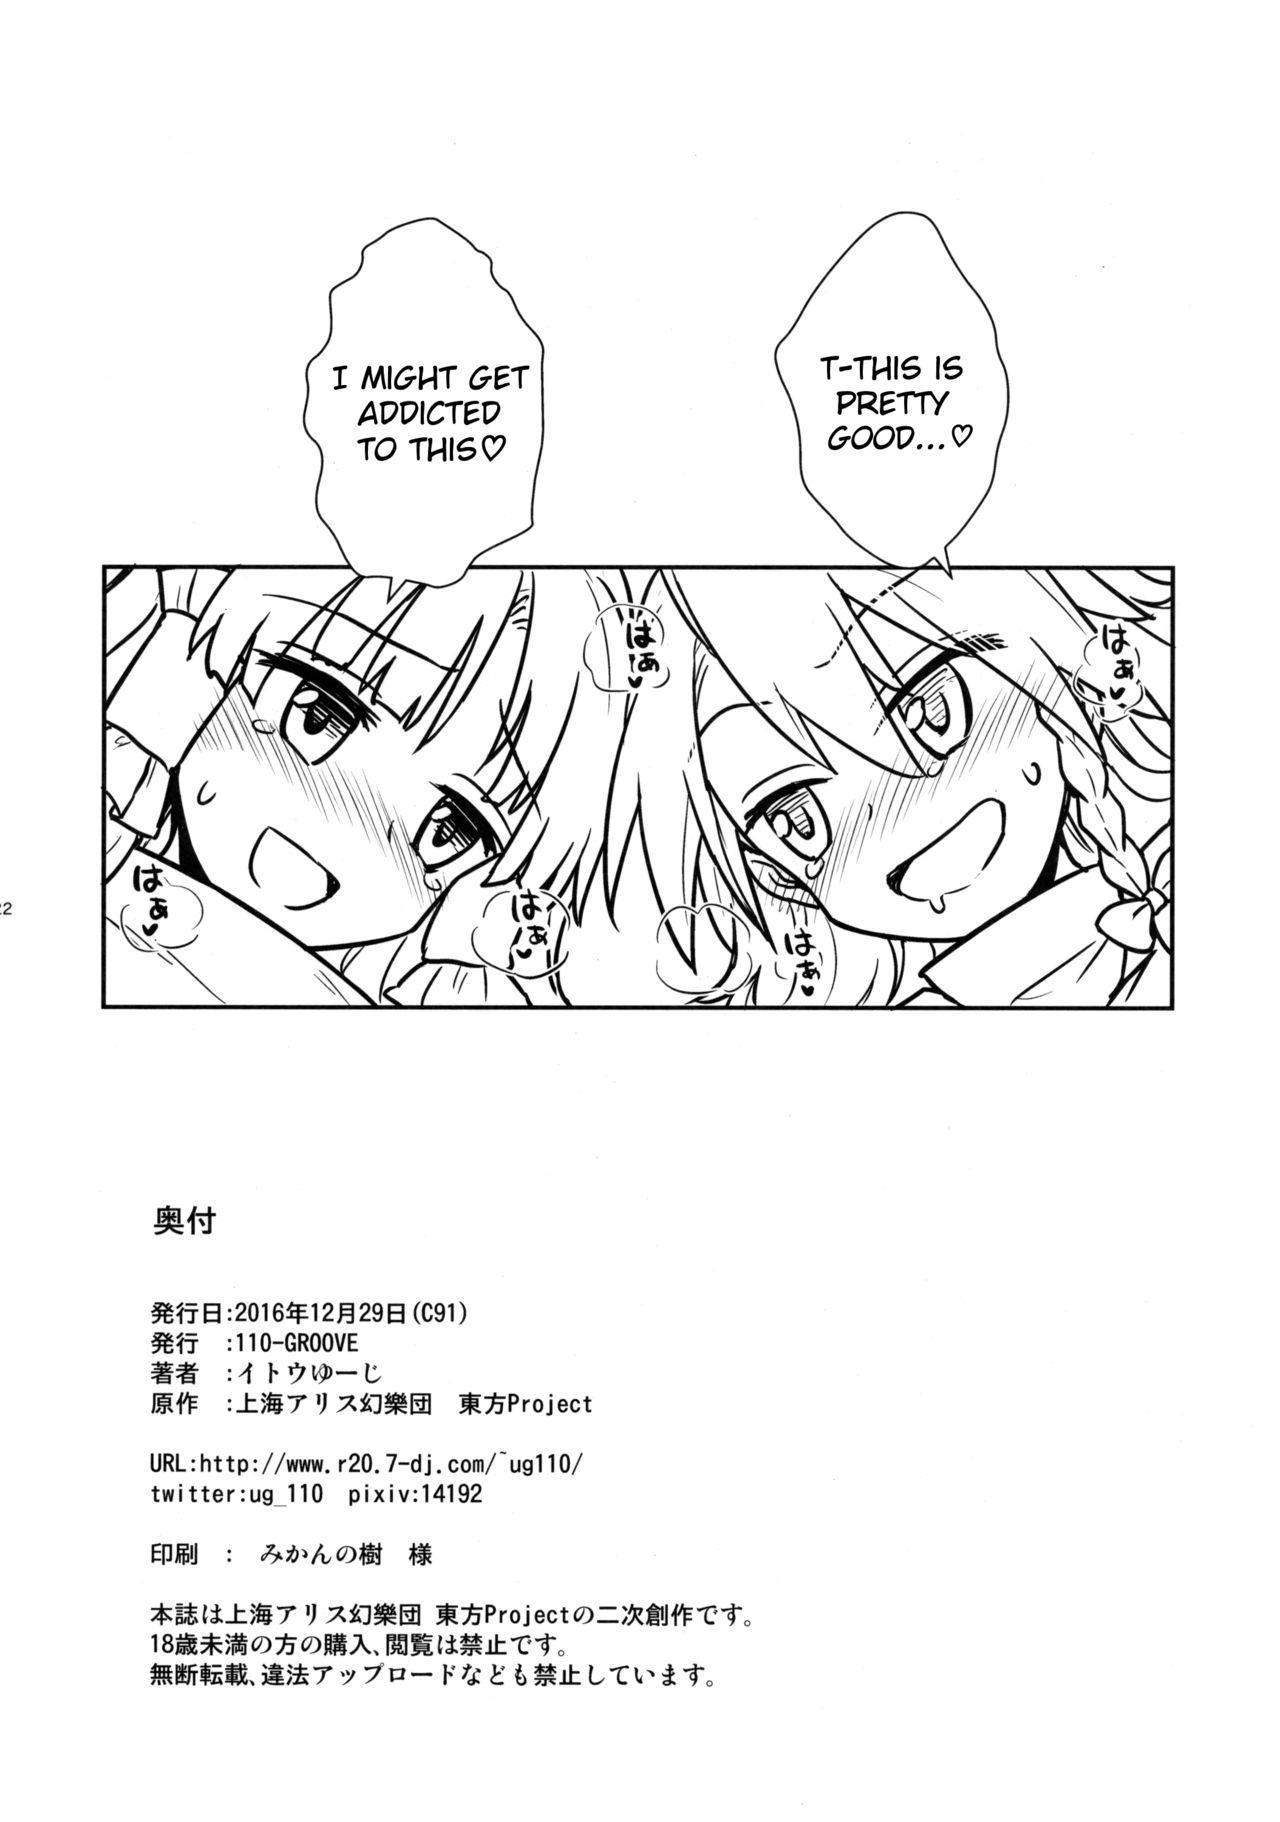 (C91) [110-GROOVE (Itou Yuuji)] Otoshigoro no Reimu-san to Marisa-san (Touhou Project) [English] [TreePerception] 20